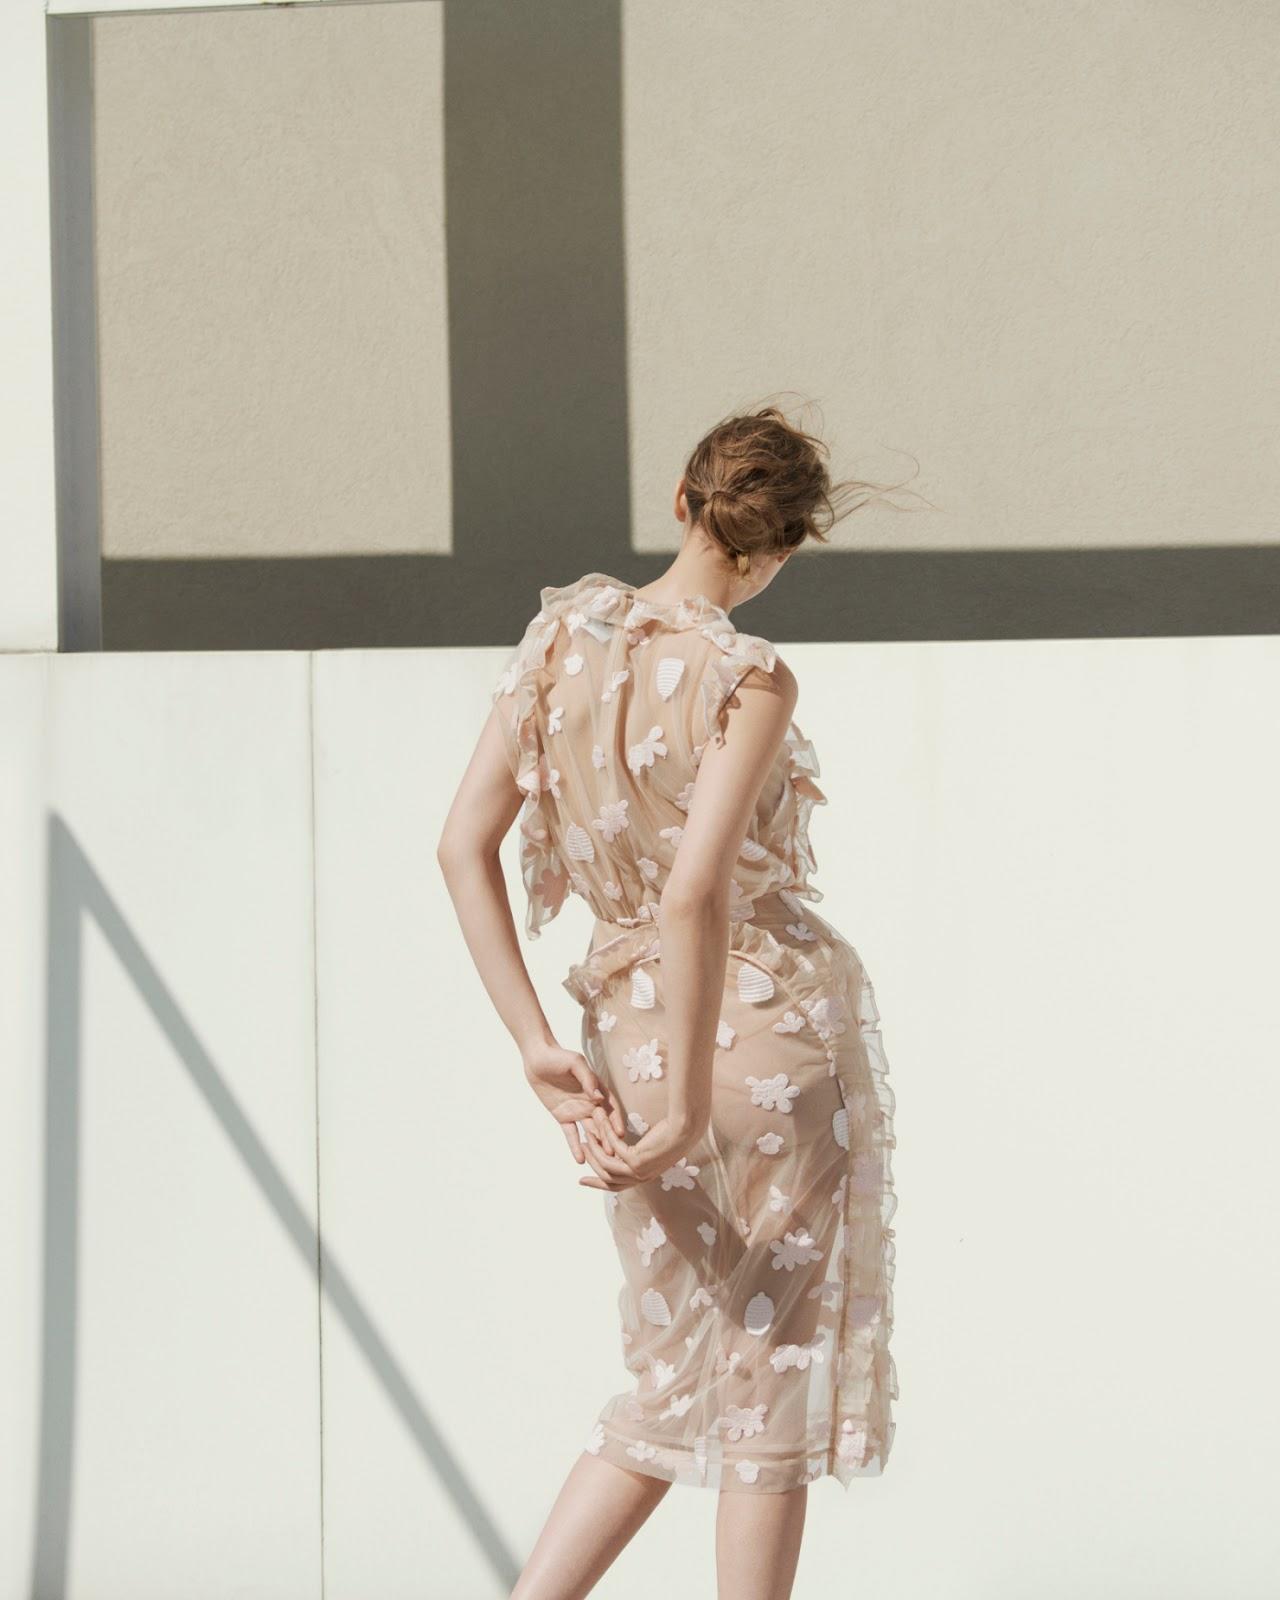 Melina Gesto in Vogue Germany January 2016 (photography: Julia Noni, styling: Kathrin Schiffner, hair: Christian Eberhard, make-up: Lili Choi) via www.fashionedbylove.co.uk british fashion blog